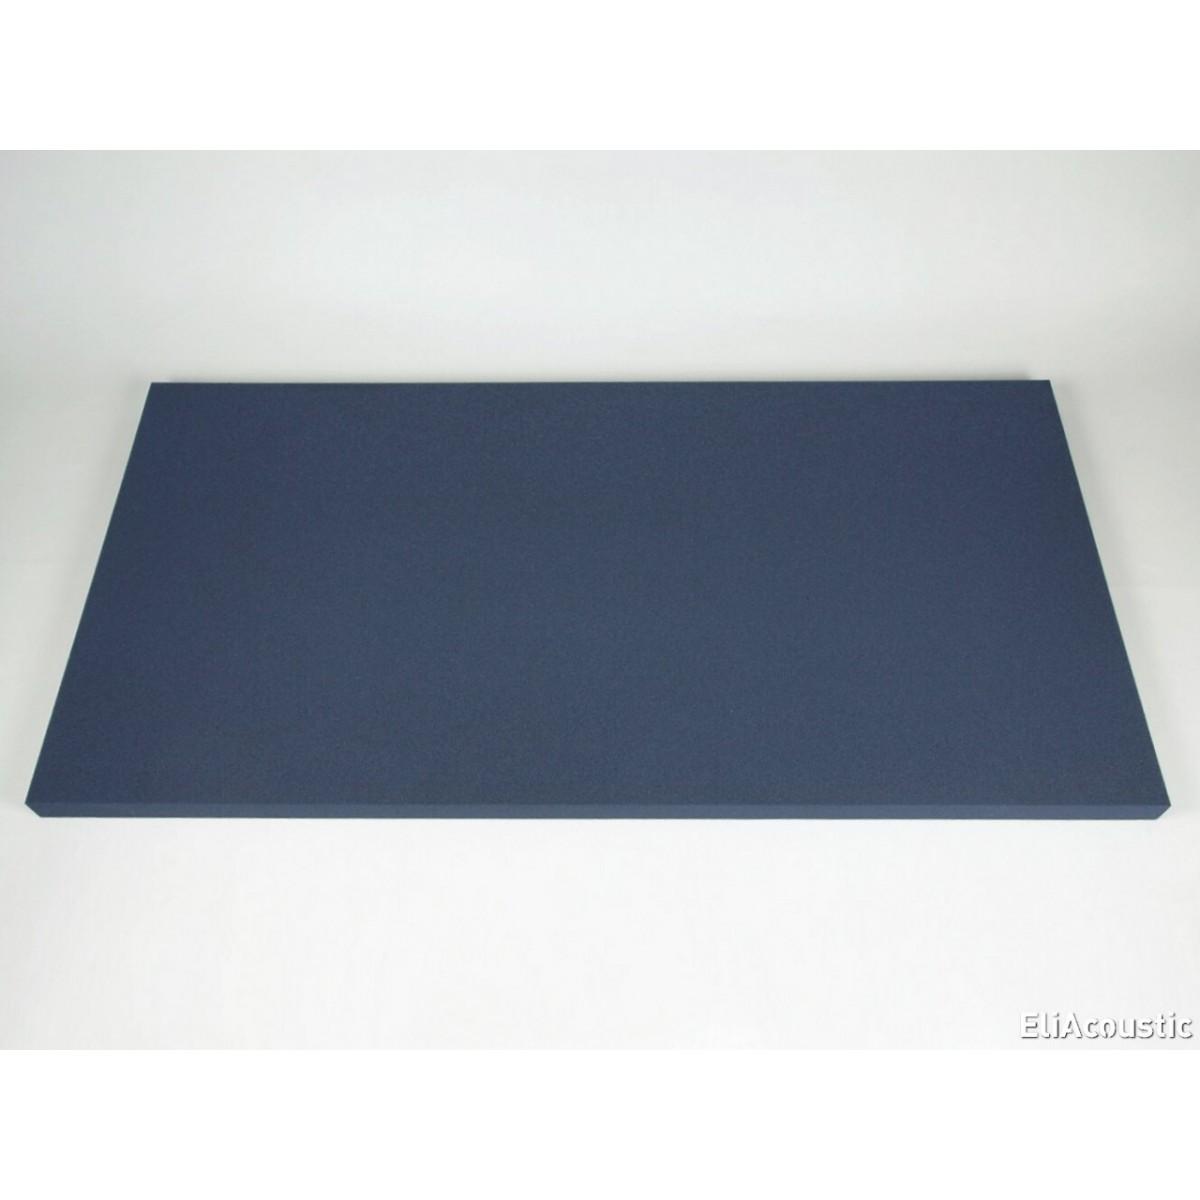 EliAcoustic Regular 120.4 Pure Dark Blue